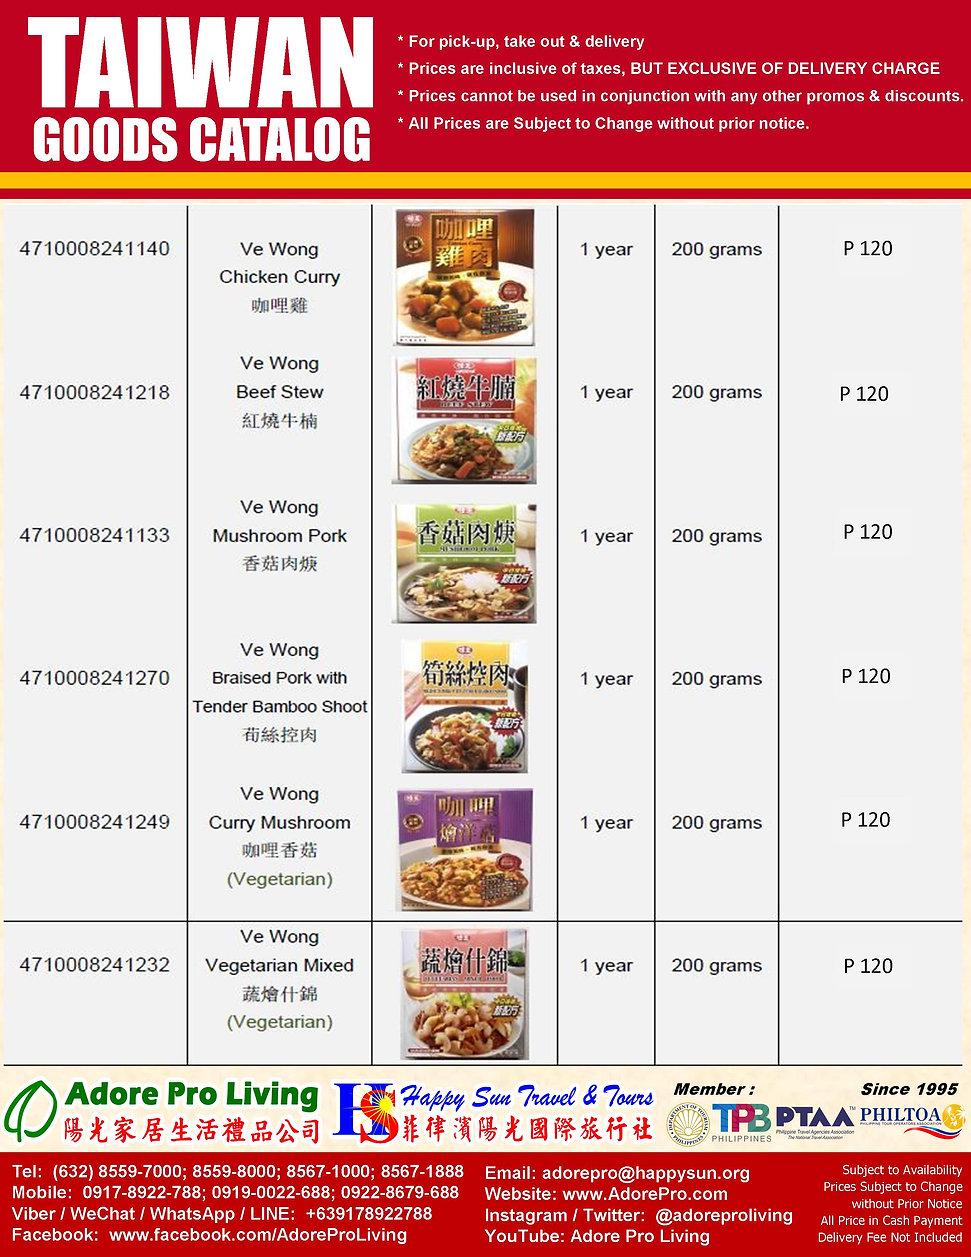 P2_Taiwan Goods Catalog_202009119.jpg